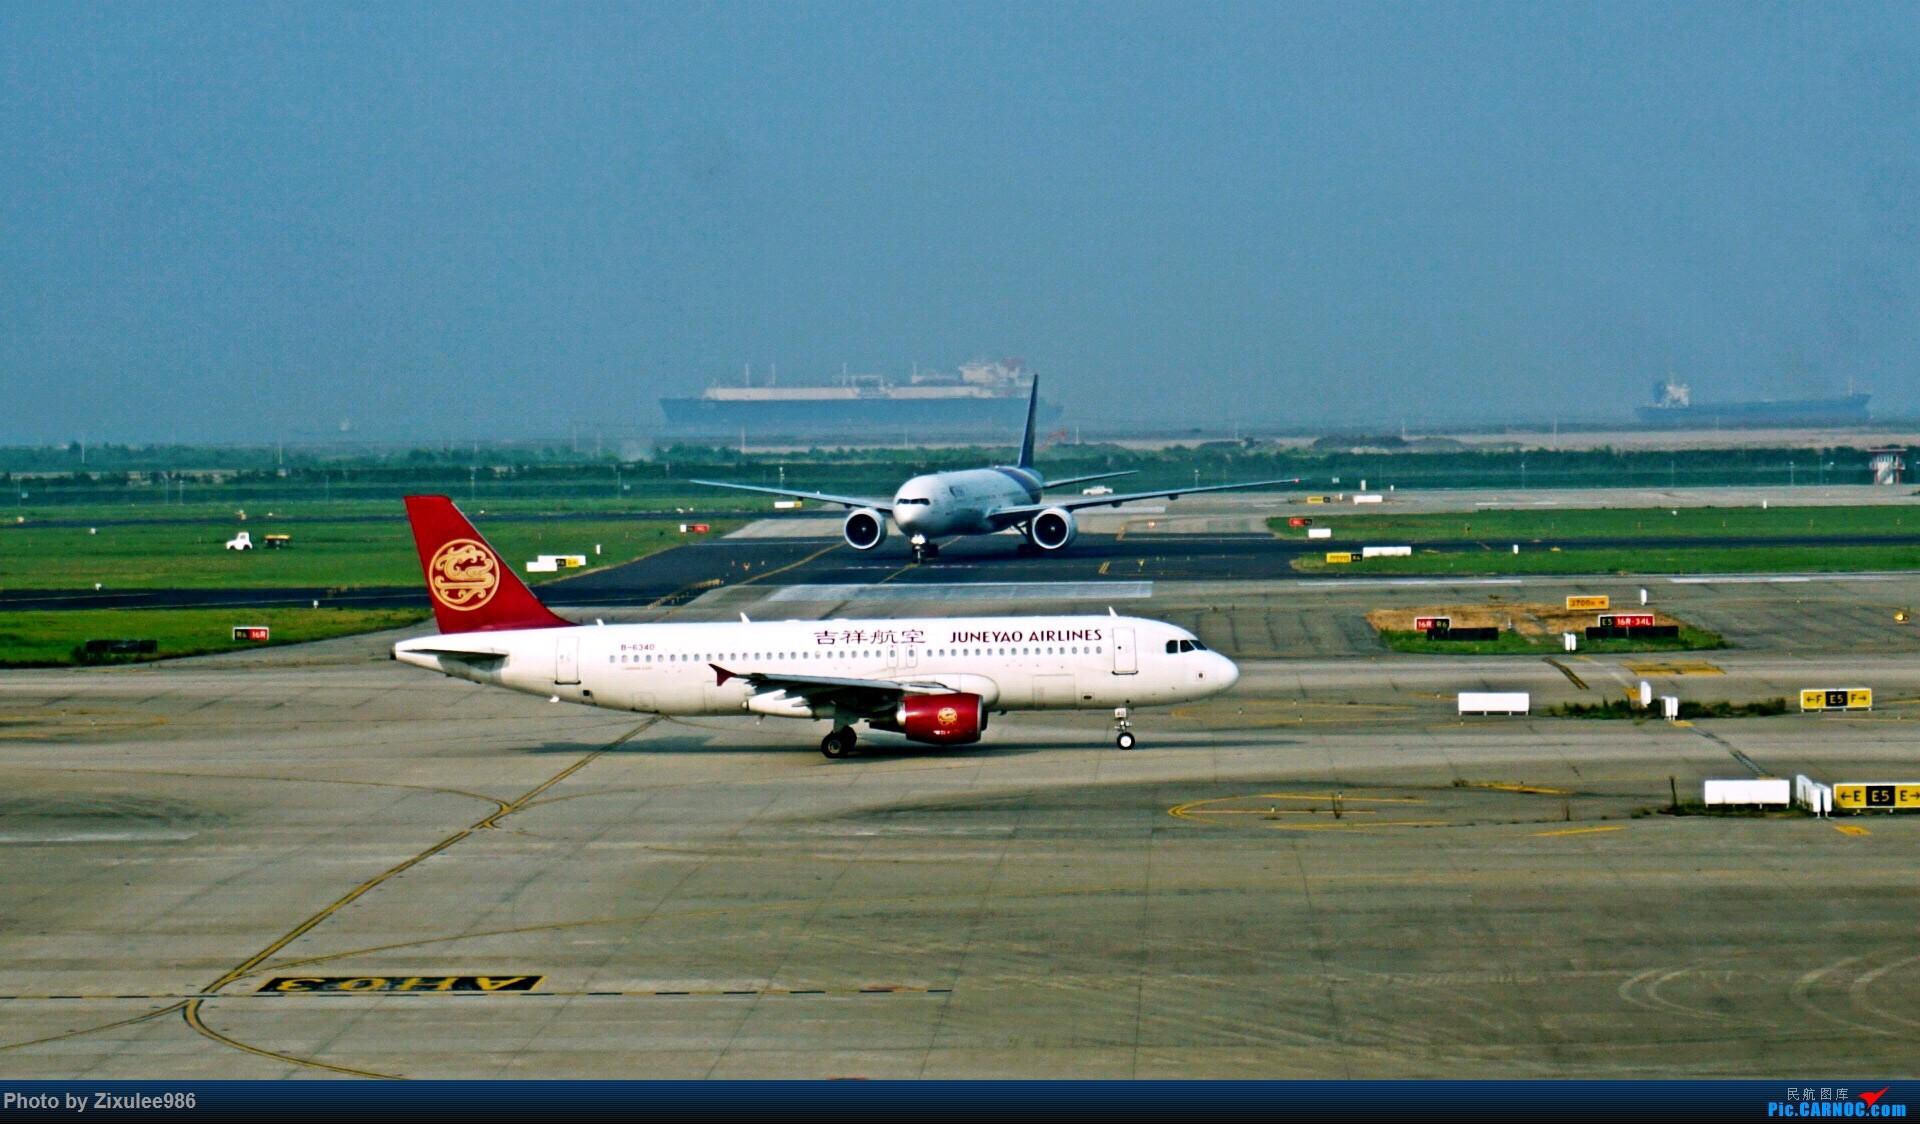 Re:[原创]加拿大21日游学之旅 (二)~加航AC28..PVG-YYZ到达多村后的雨天~多图缓更,请各位大侠谅解~ AIRBUS A320-200 B-6340 中国上海浦东国际机场